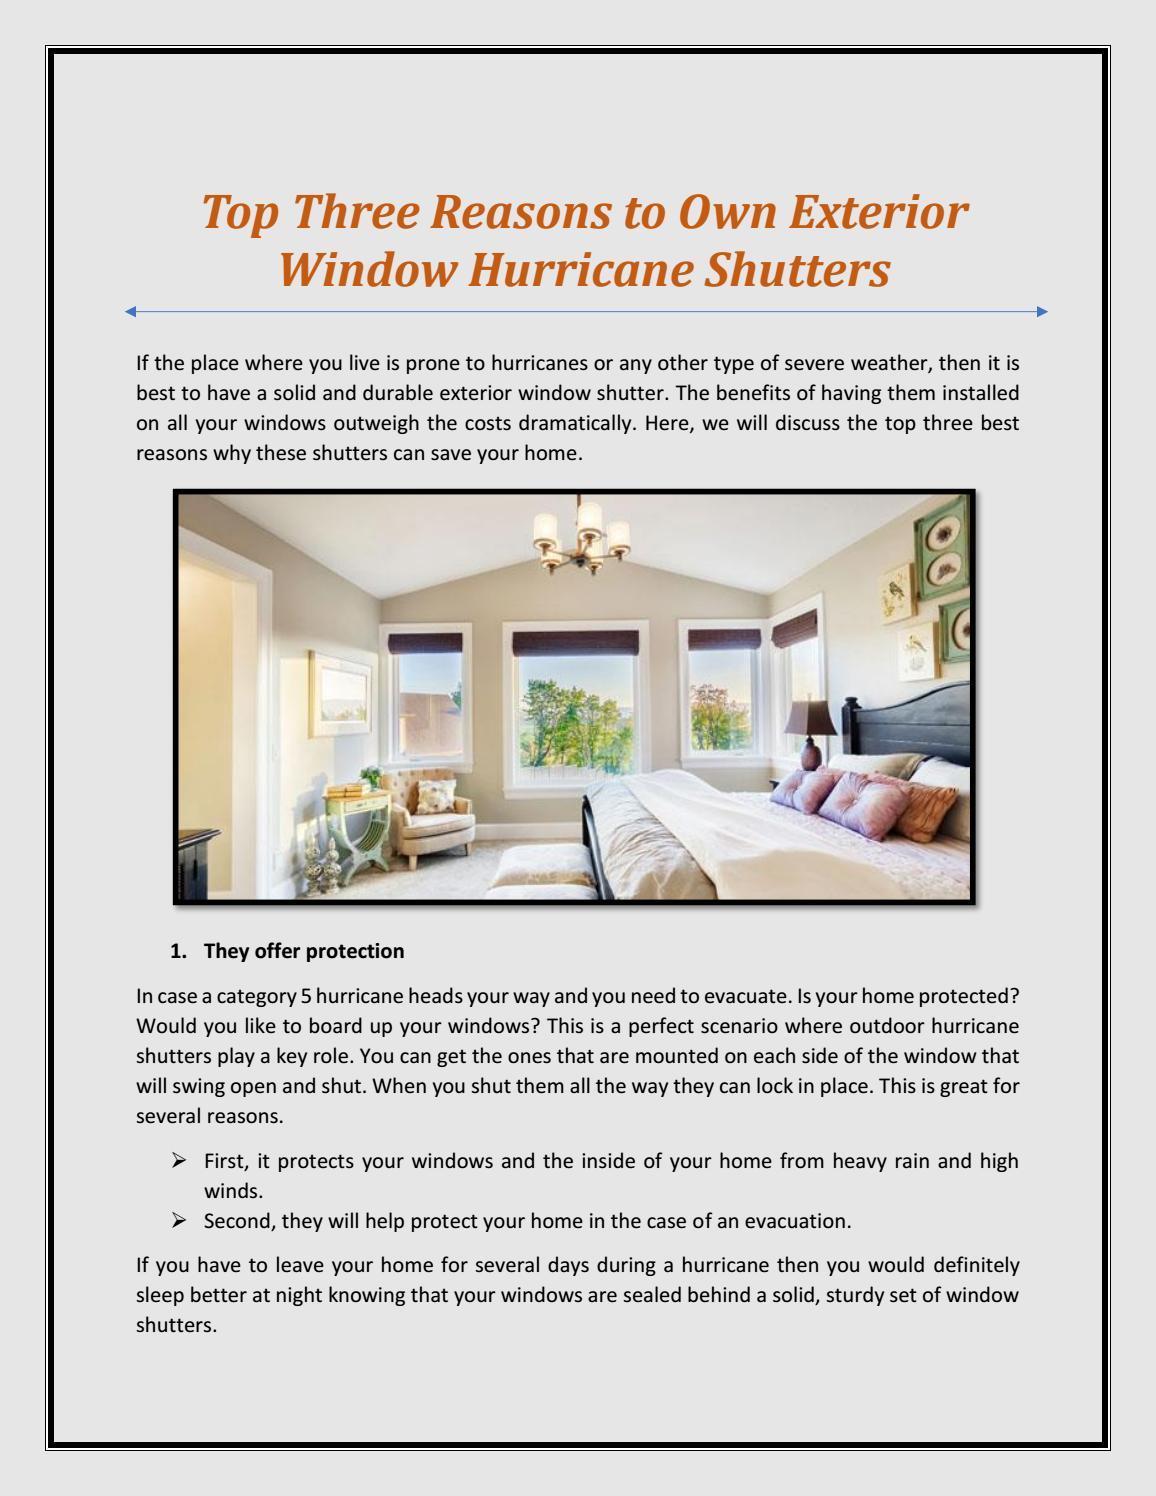 Top Three Reasons To Own Exterior Window Hurricane Shutters